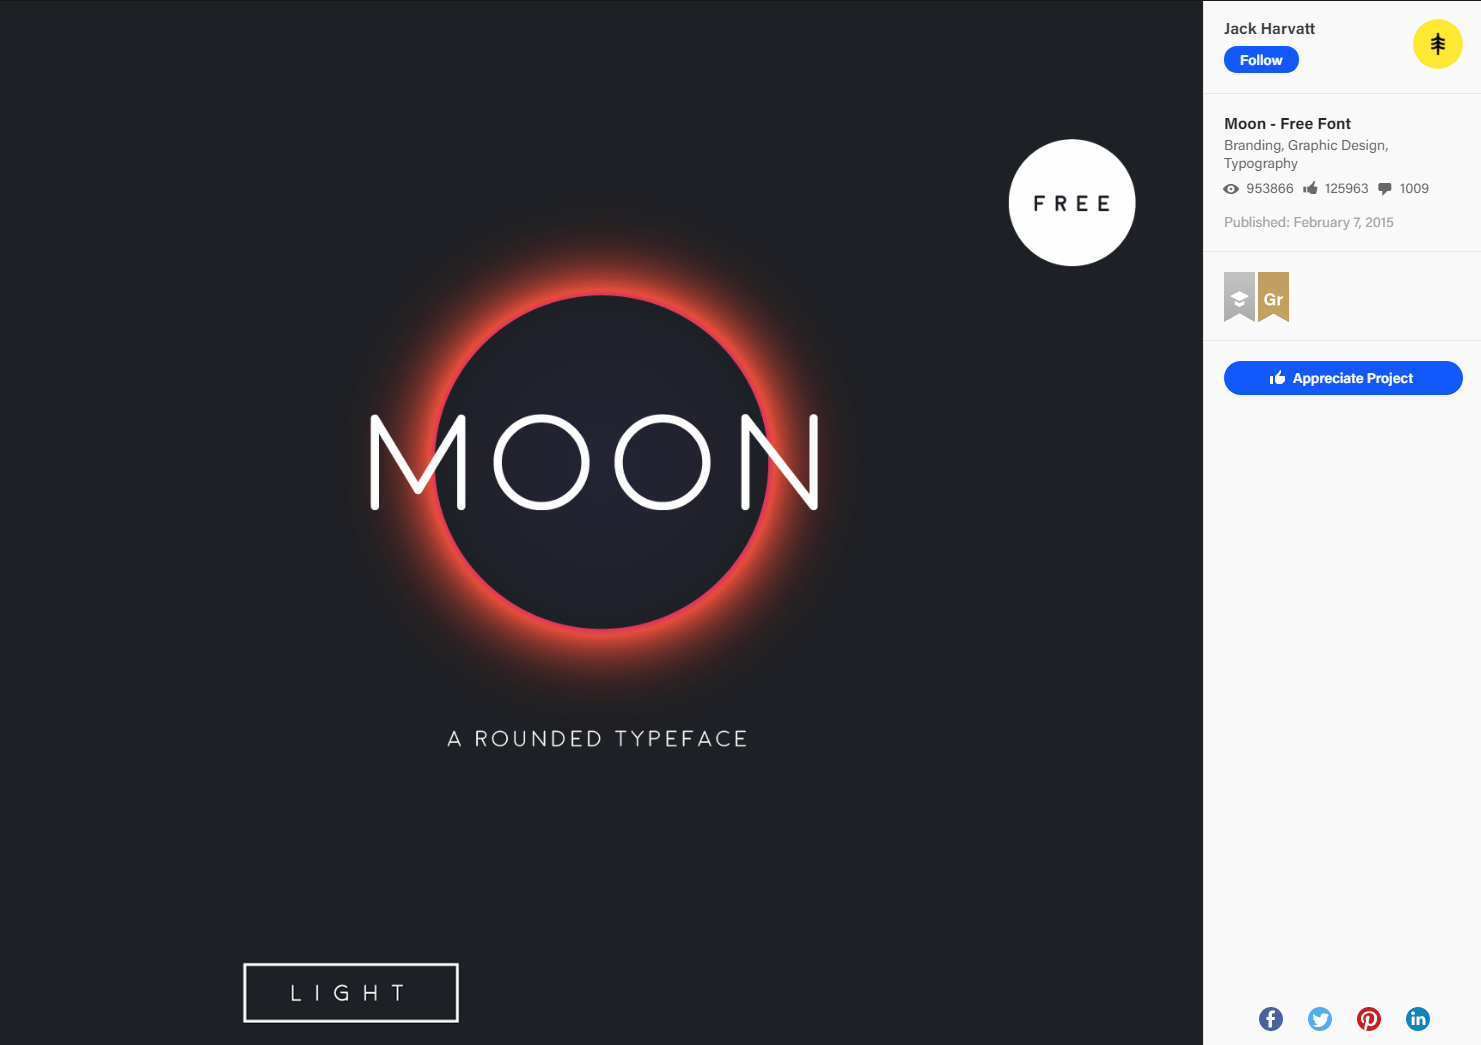 Moon - Free Font on Behance